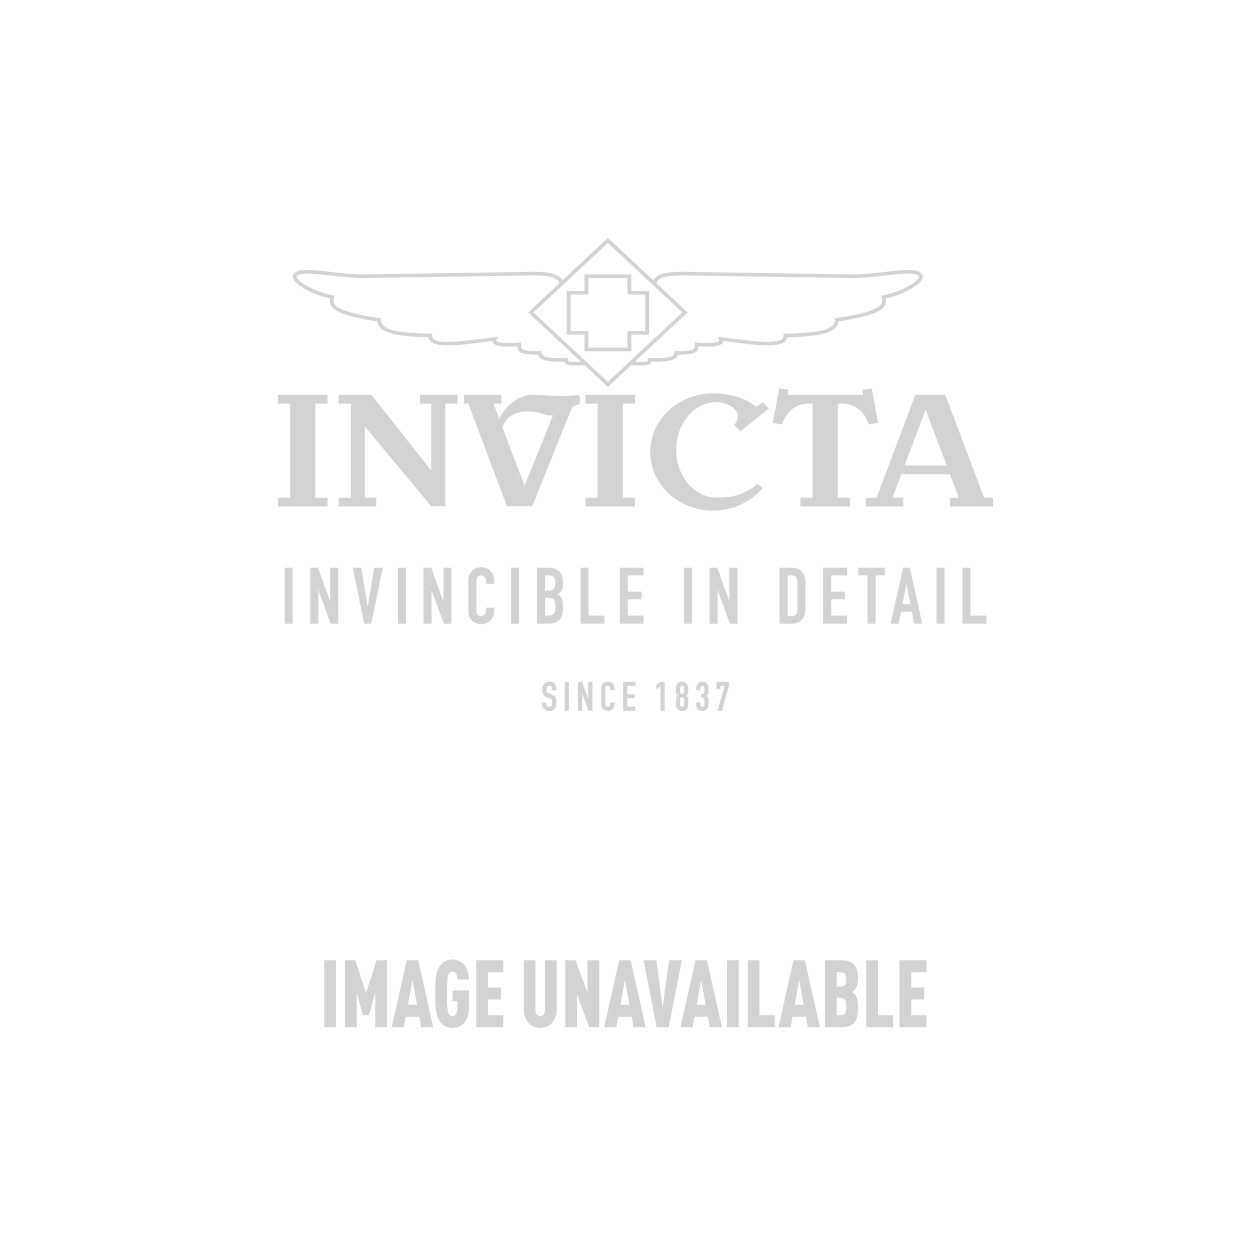 Invicta Subaqua Mens Quartz 50mm Black Case Black Dial - Model 6582